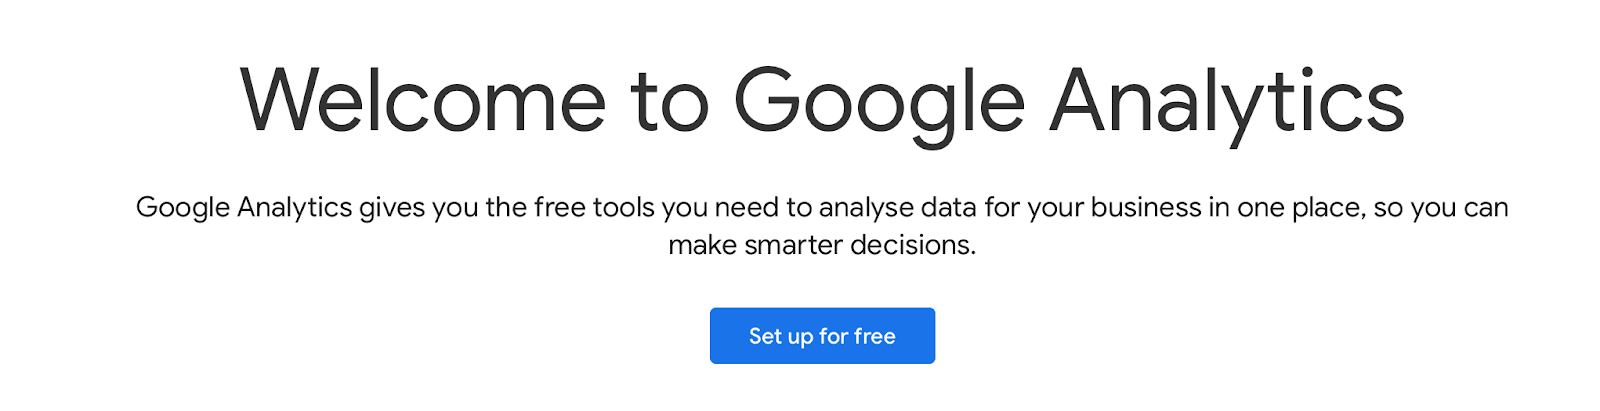 google analytics welcome notification